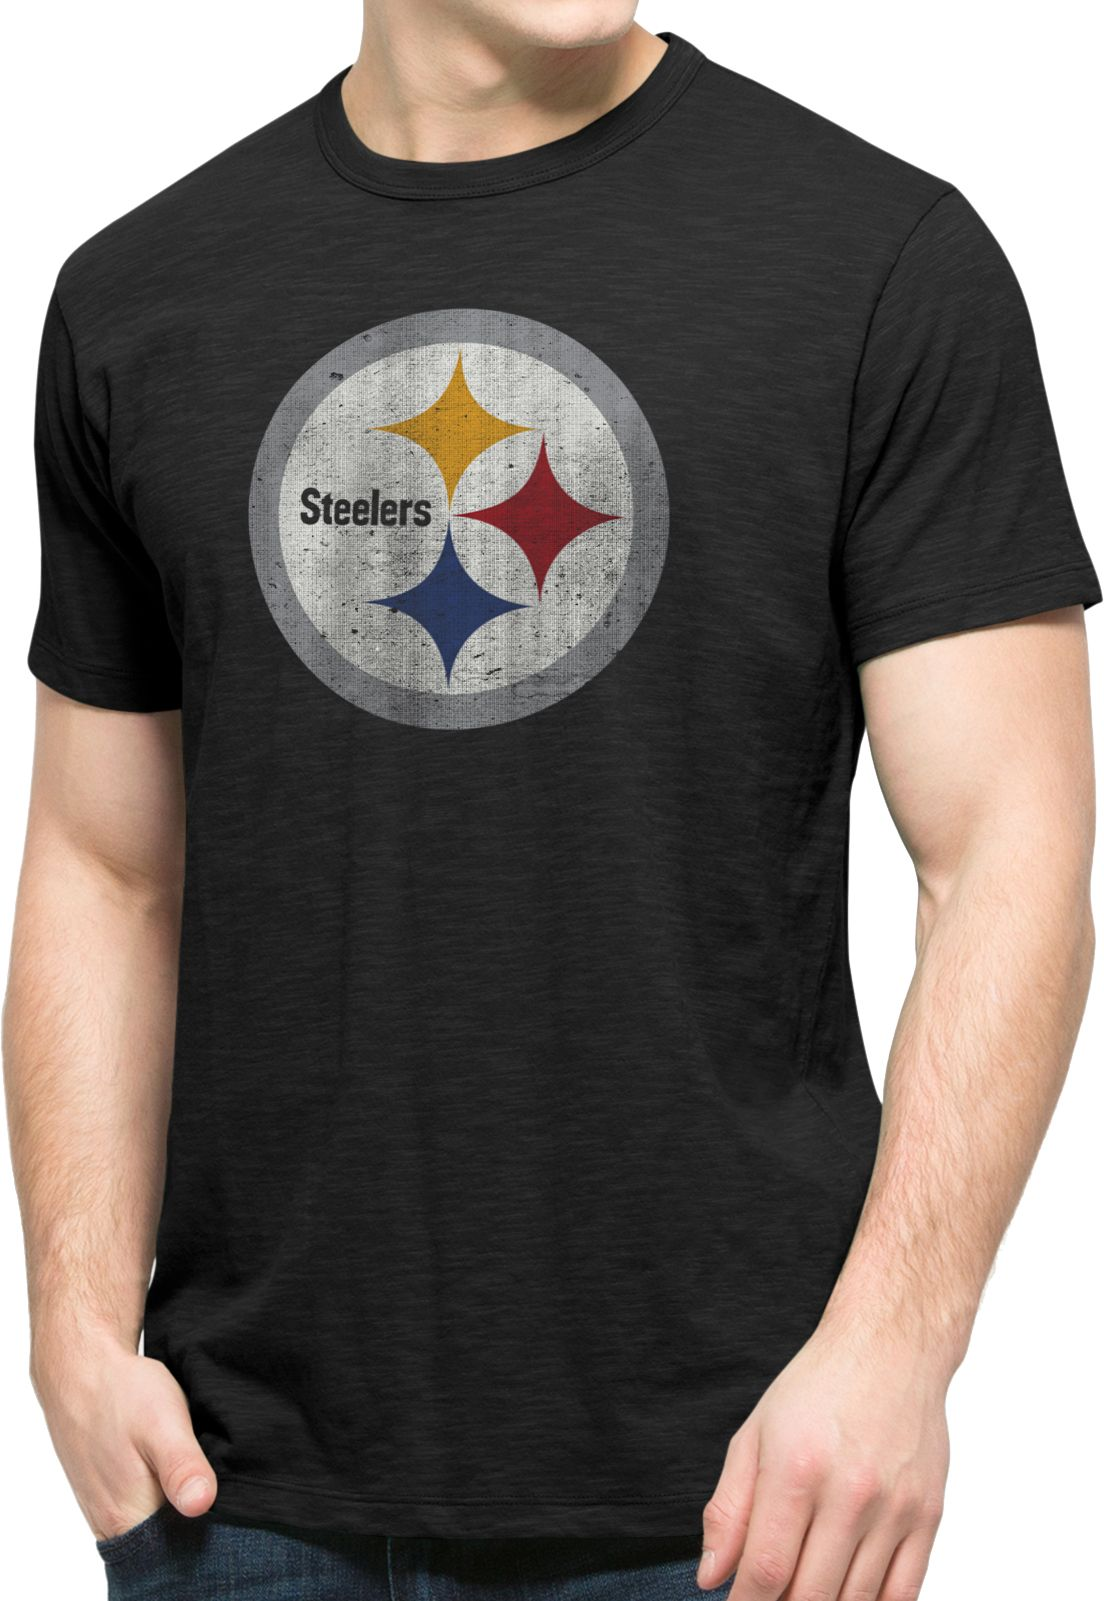 Pittsburgh Steelers Gear Near Me - Joe Maloy ef305a5a5